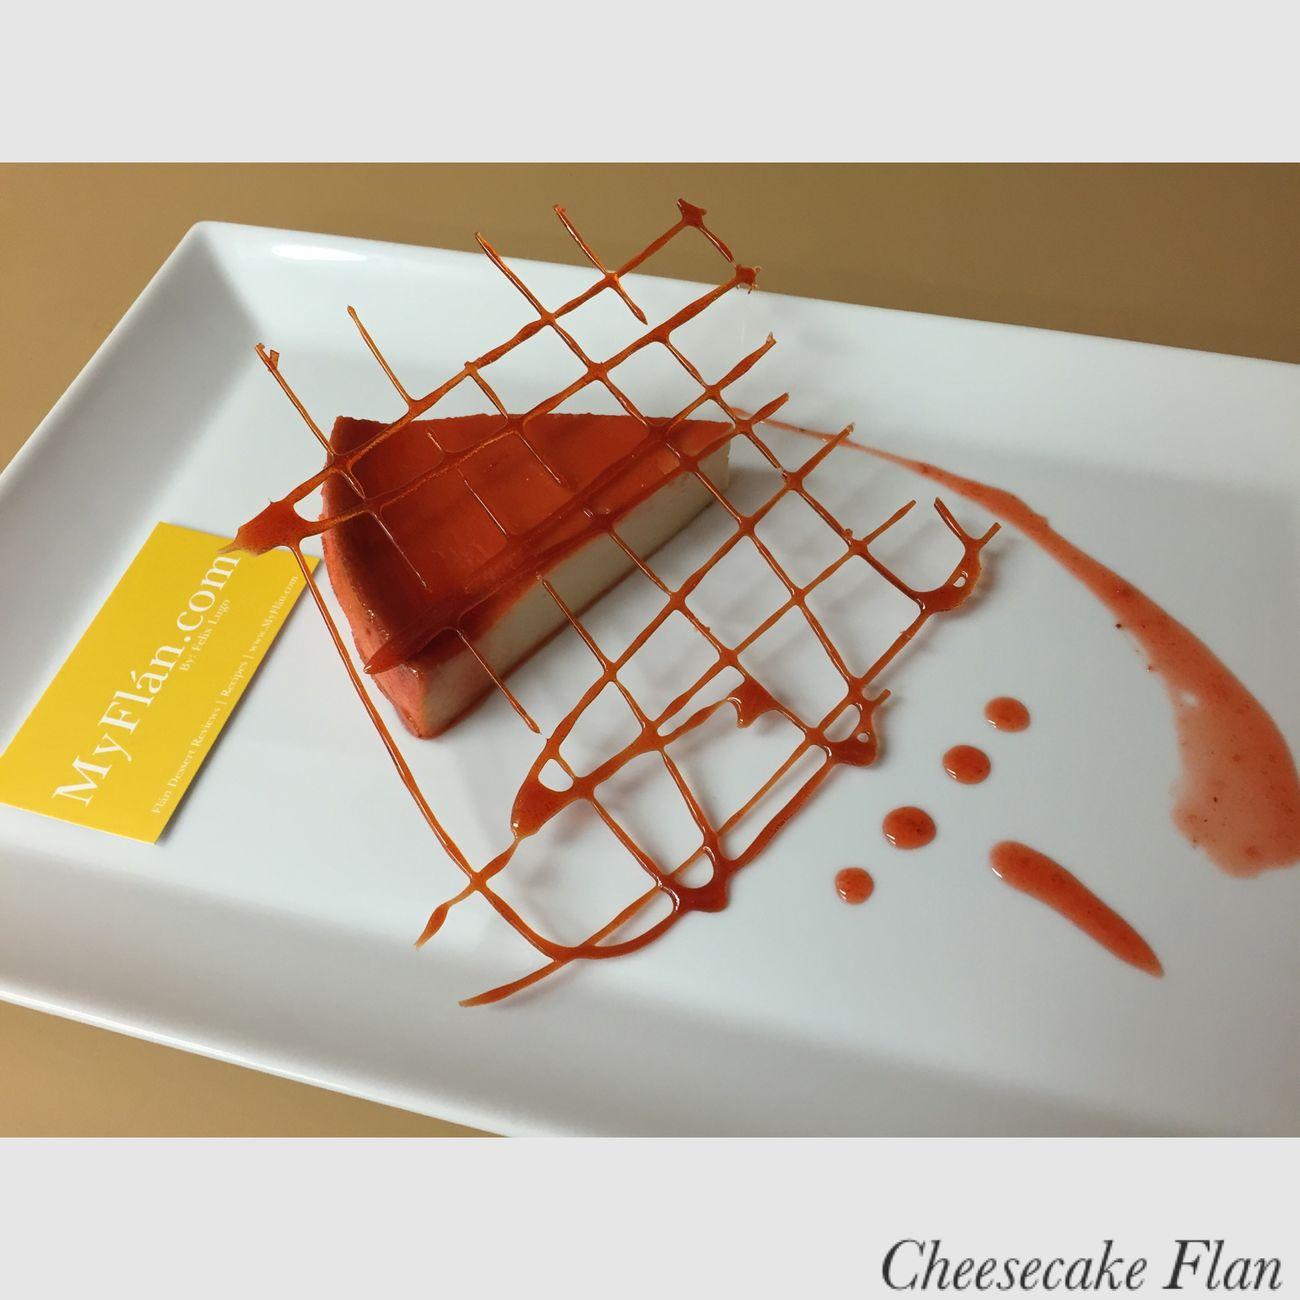 Cheesecake Cake Foodporn Sugar Pastry Flan Desserts Dessert Food Myflan